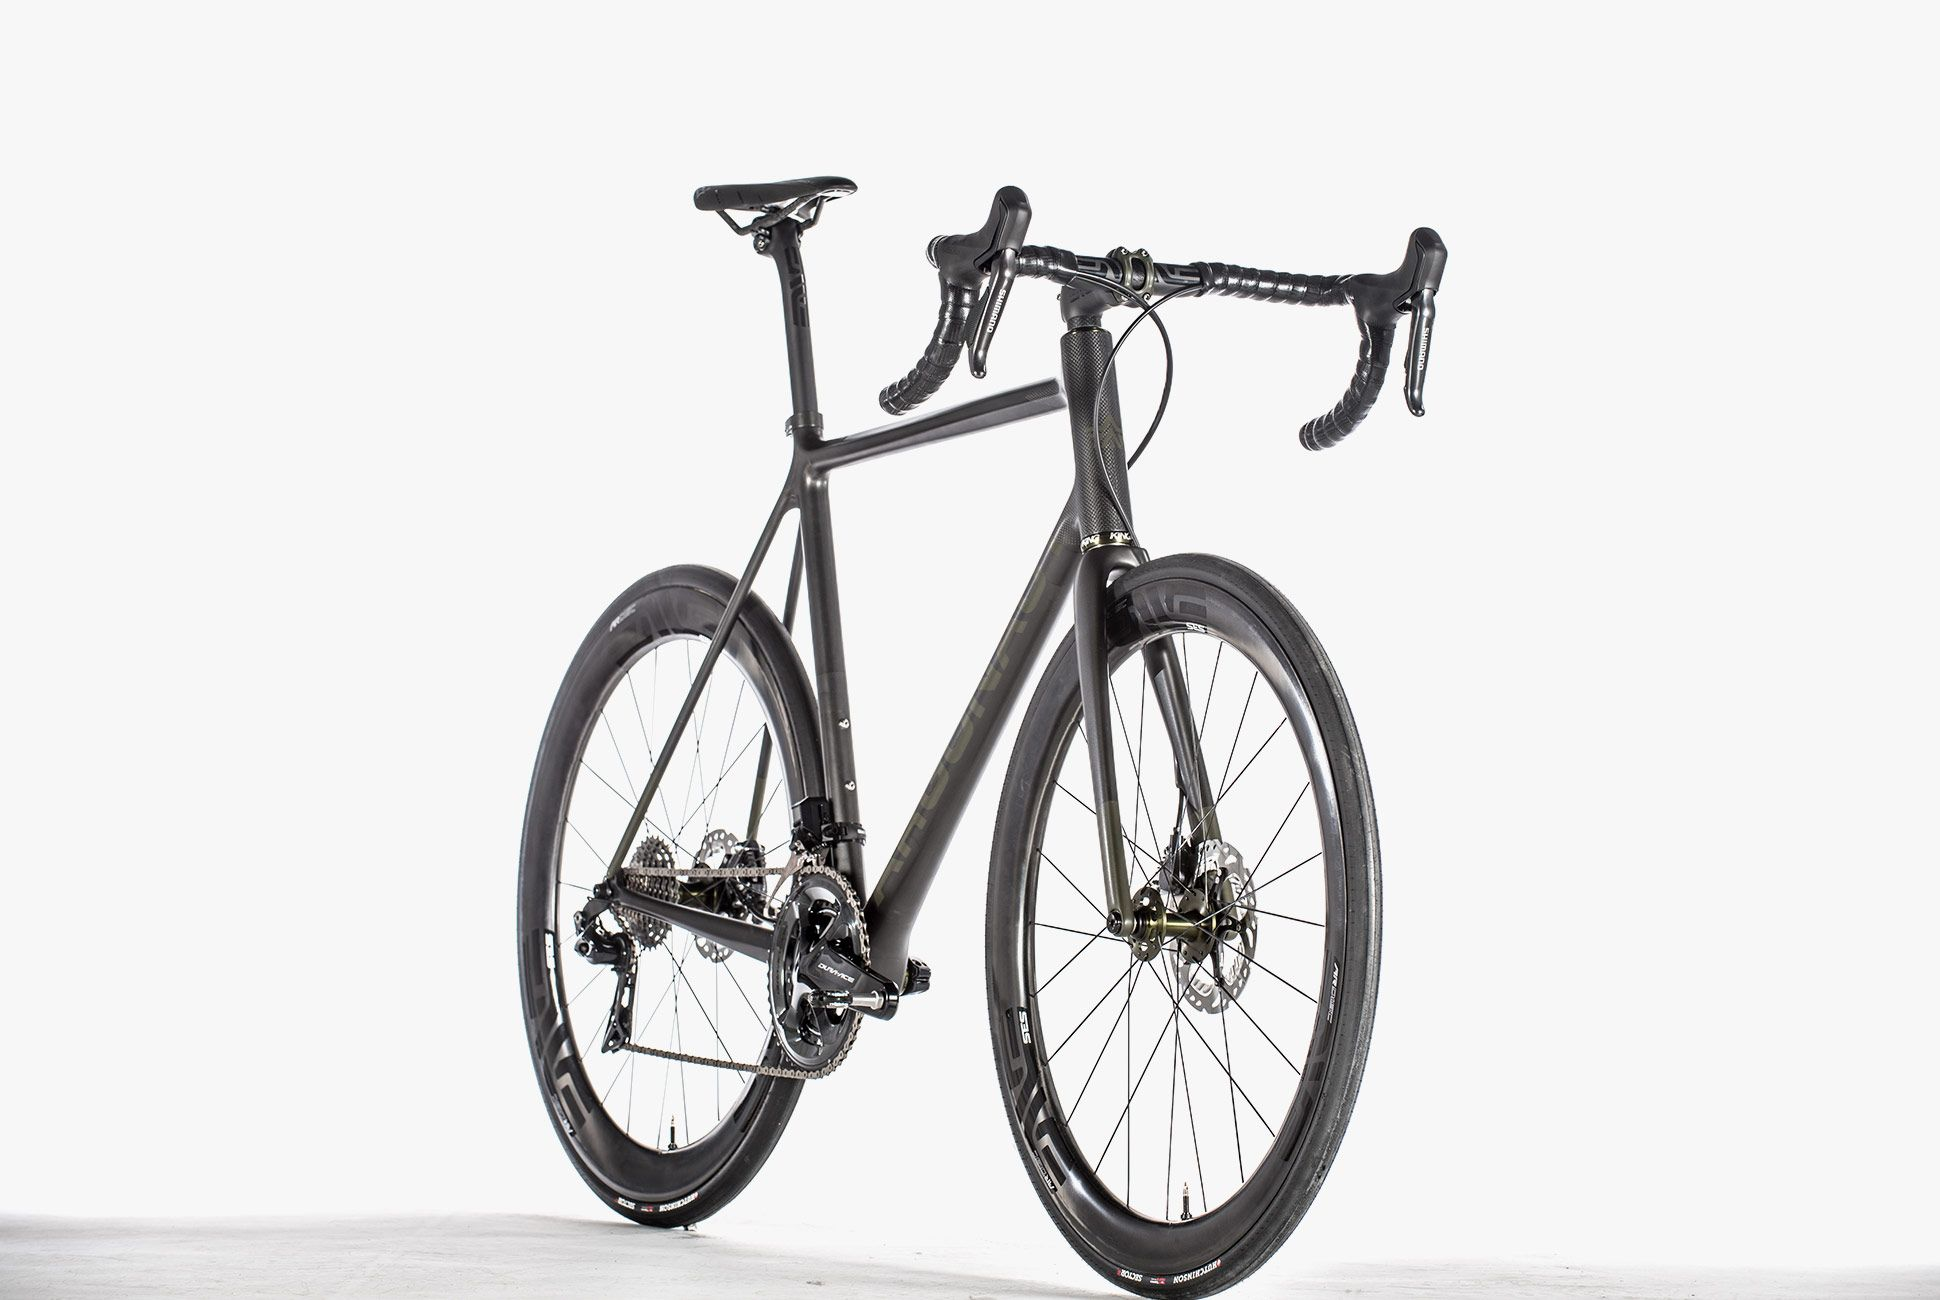 Bikes-From-NAHBS-Gear-Patrol-34